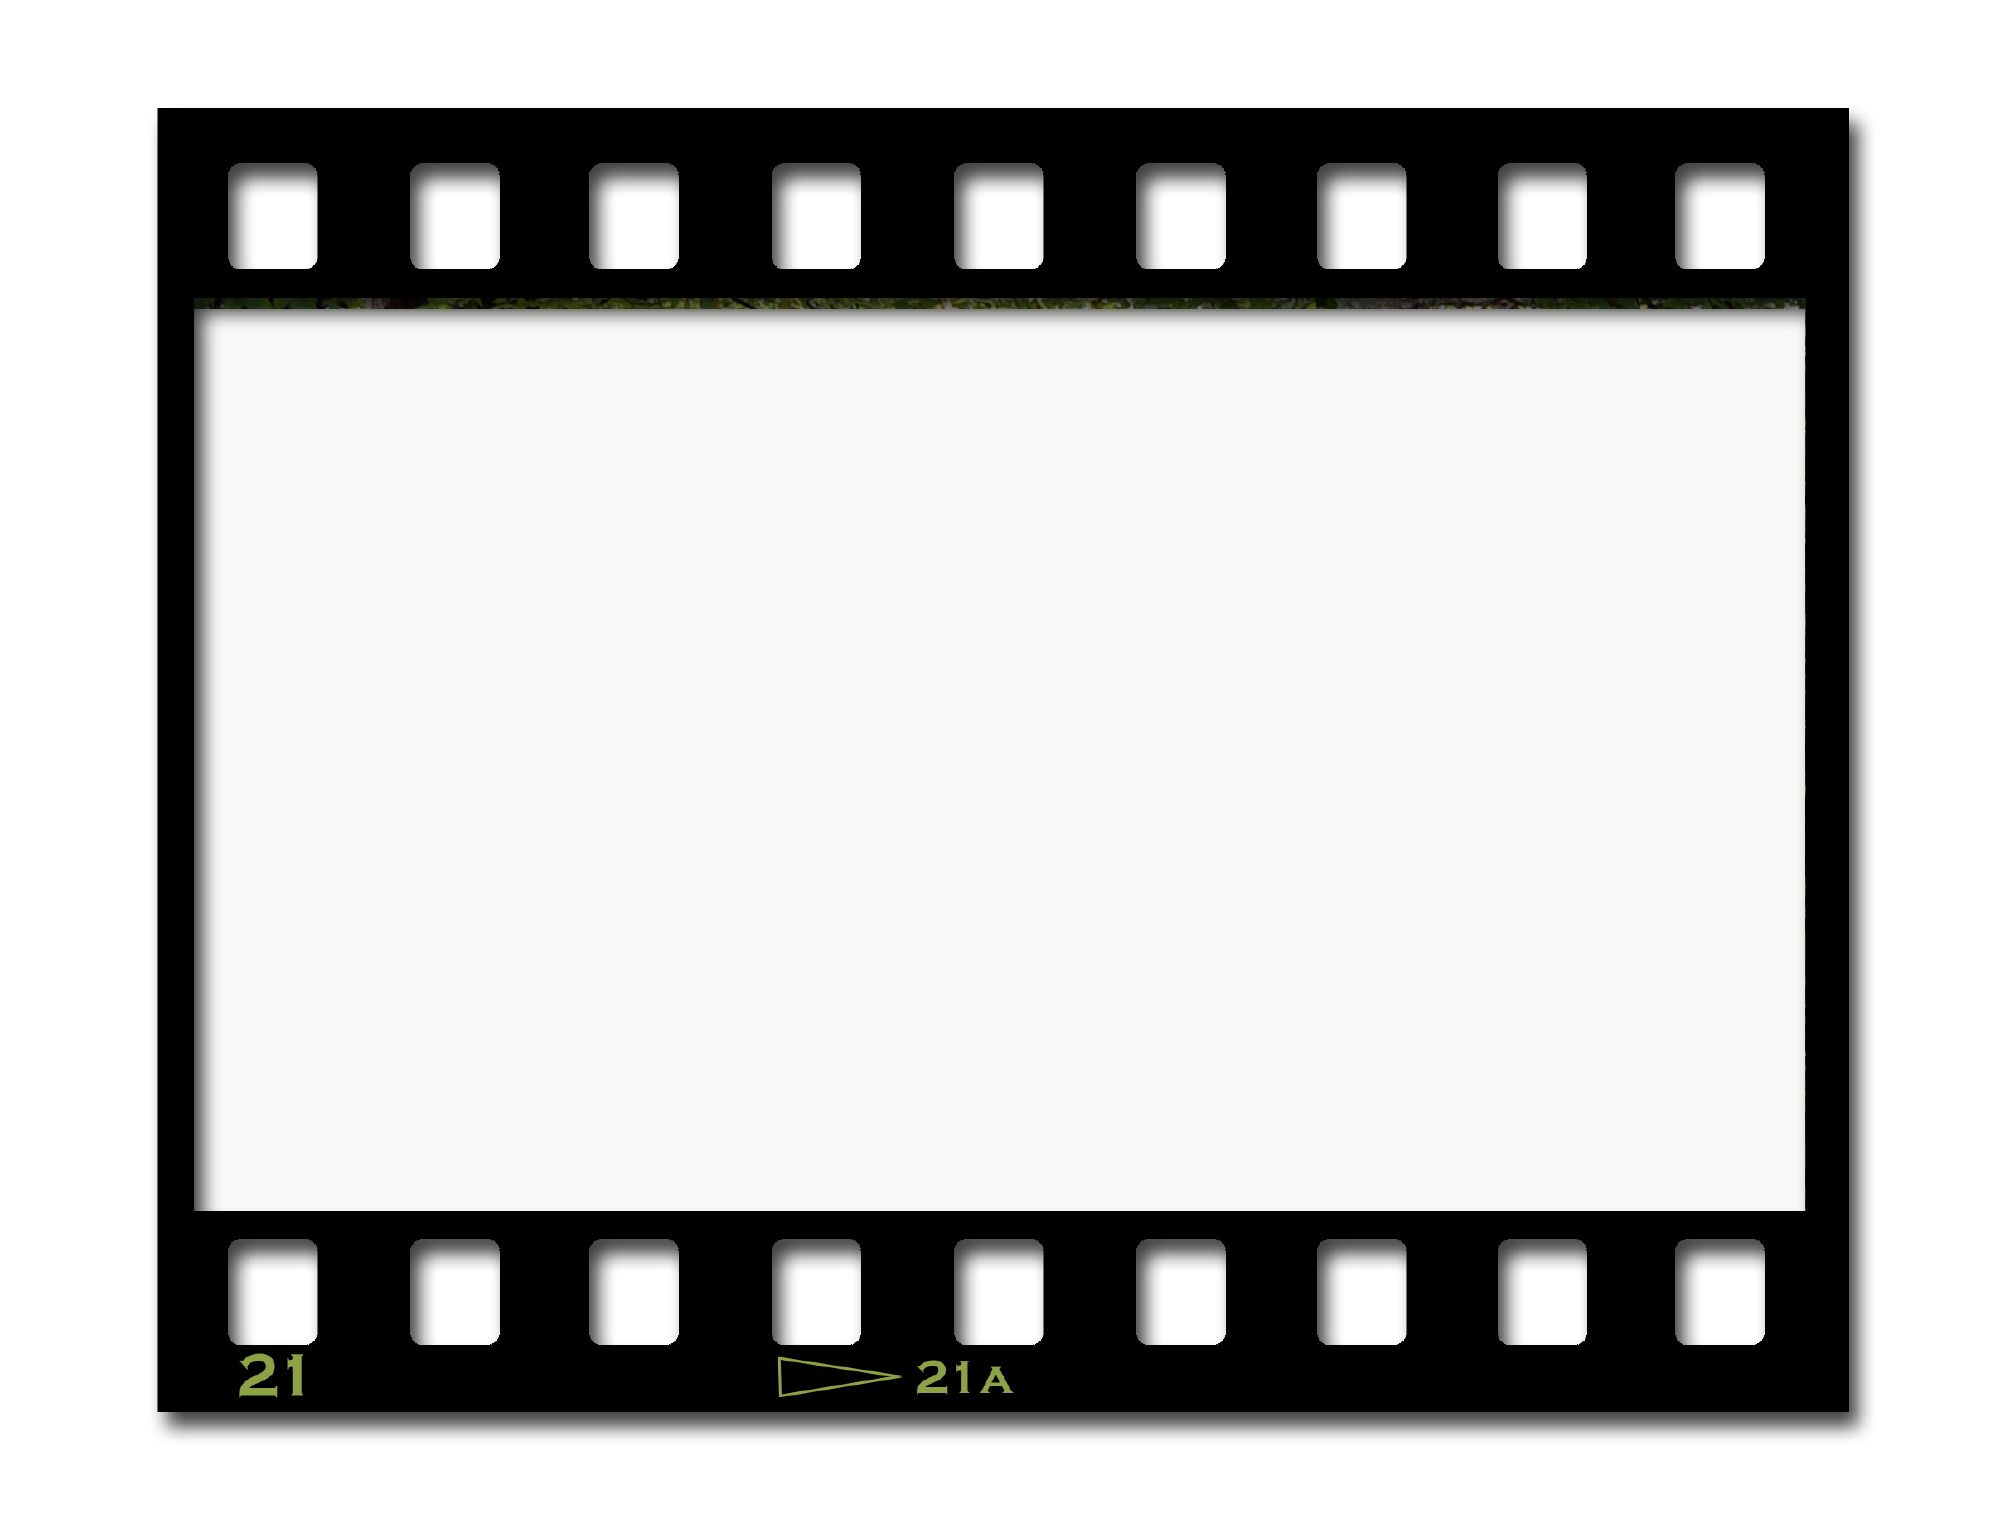 download 2,000×1,533 pixels | Framing That | Pinterest ...